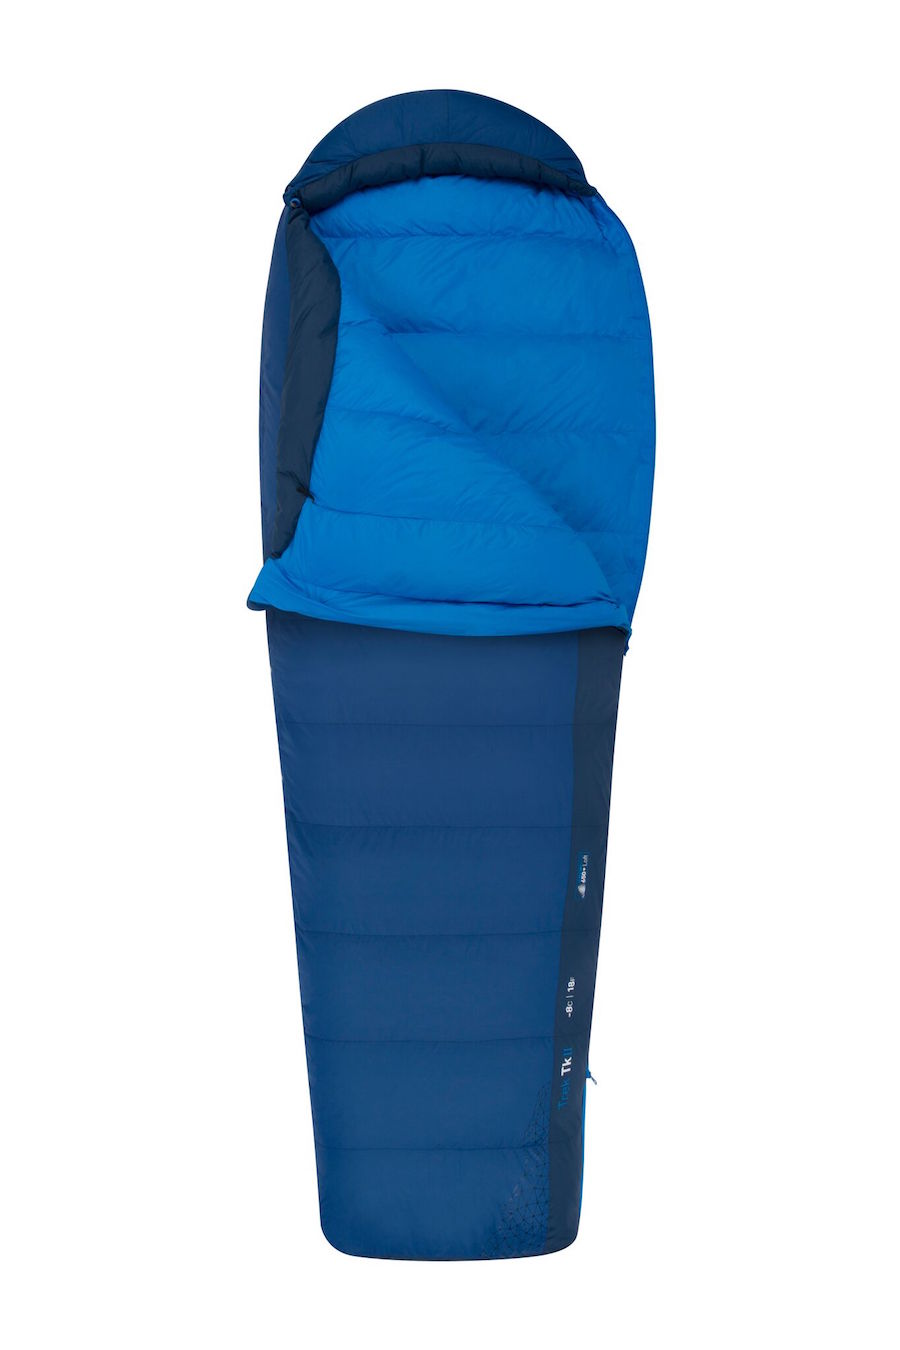 Sea To Summit Trek TkII - Sleeping bag